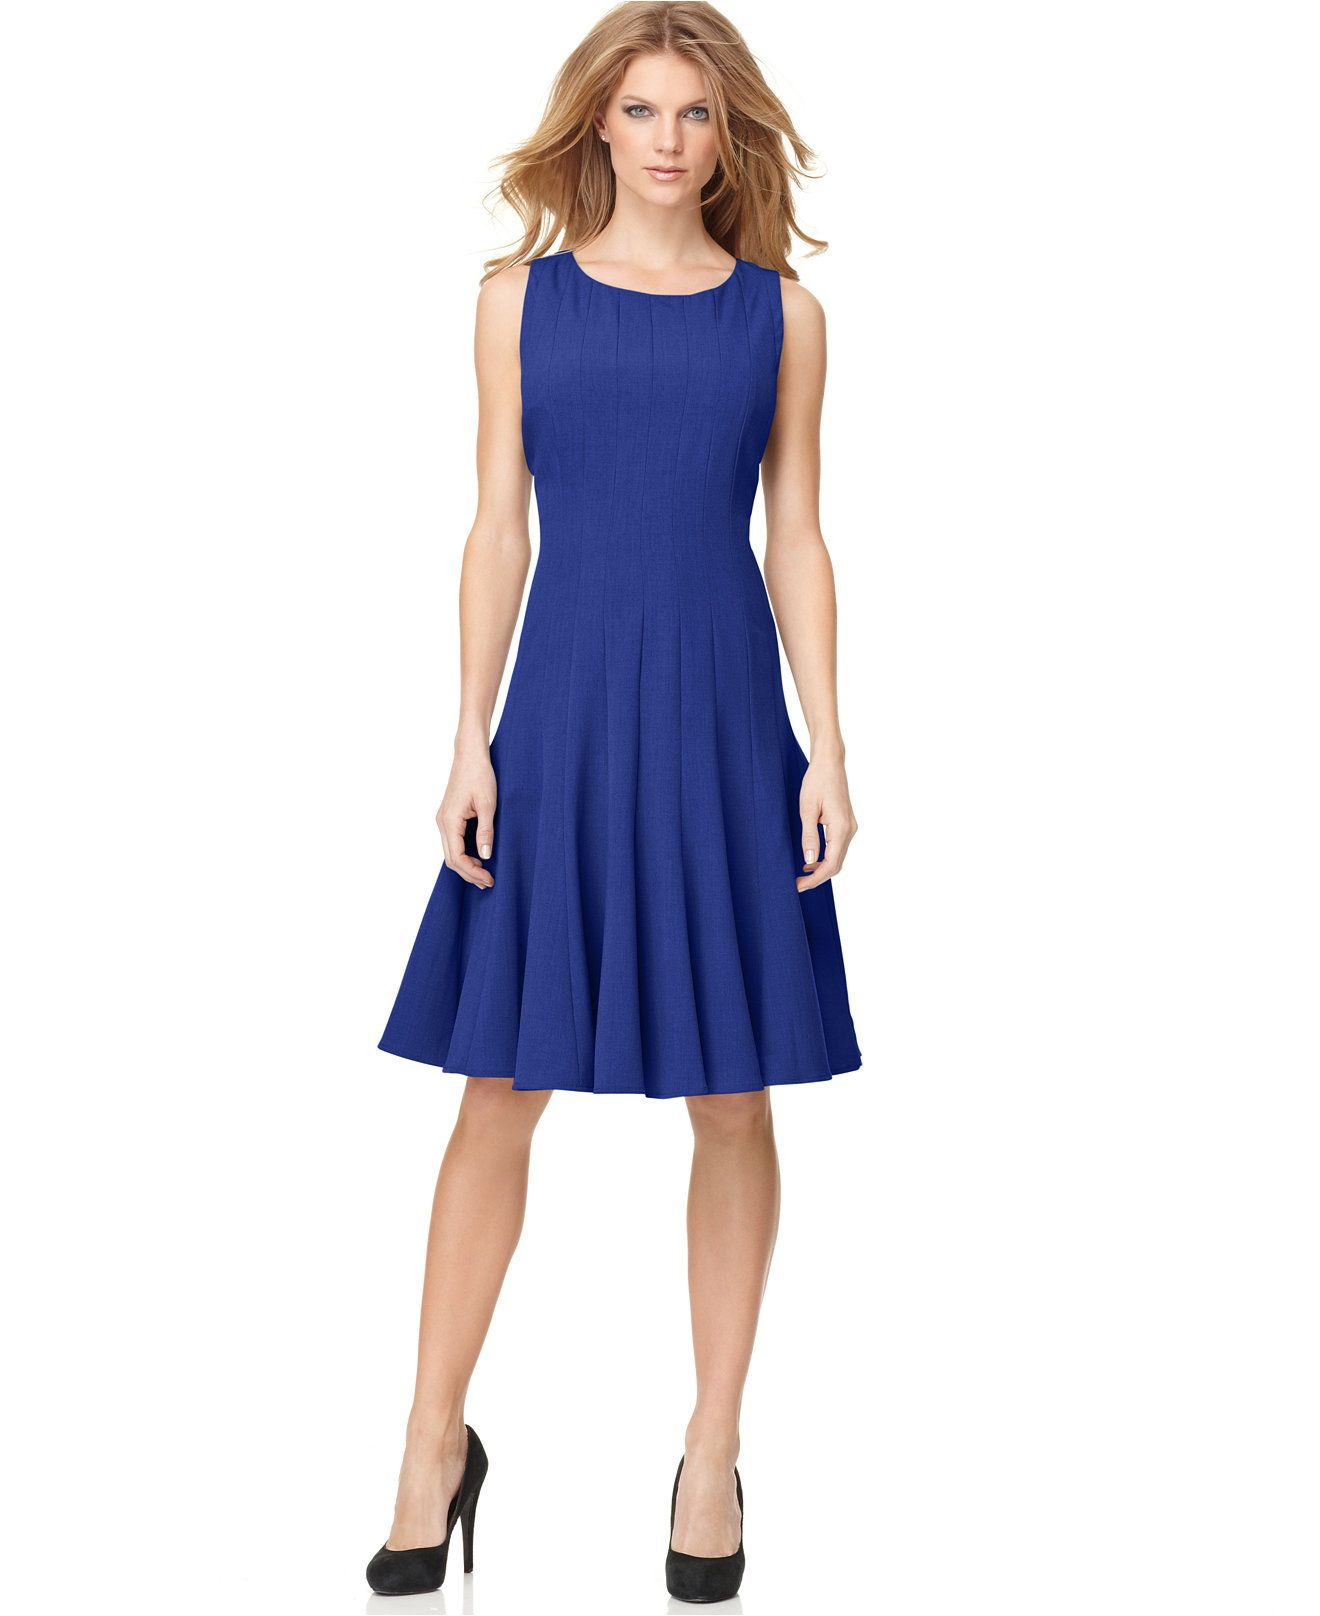 Calvin Klein Sleeveless Pleated -line Dress - Dresses